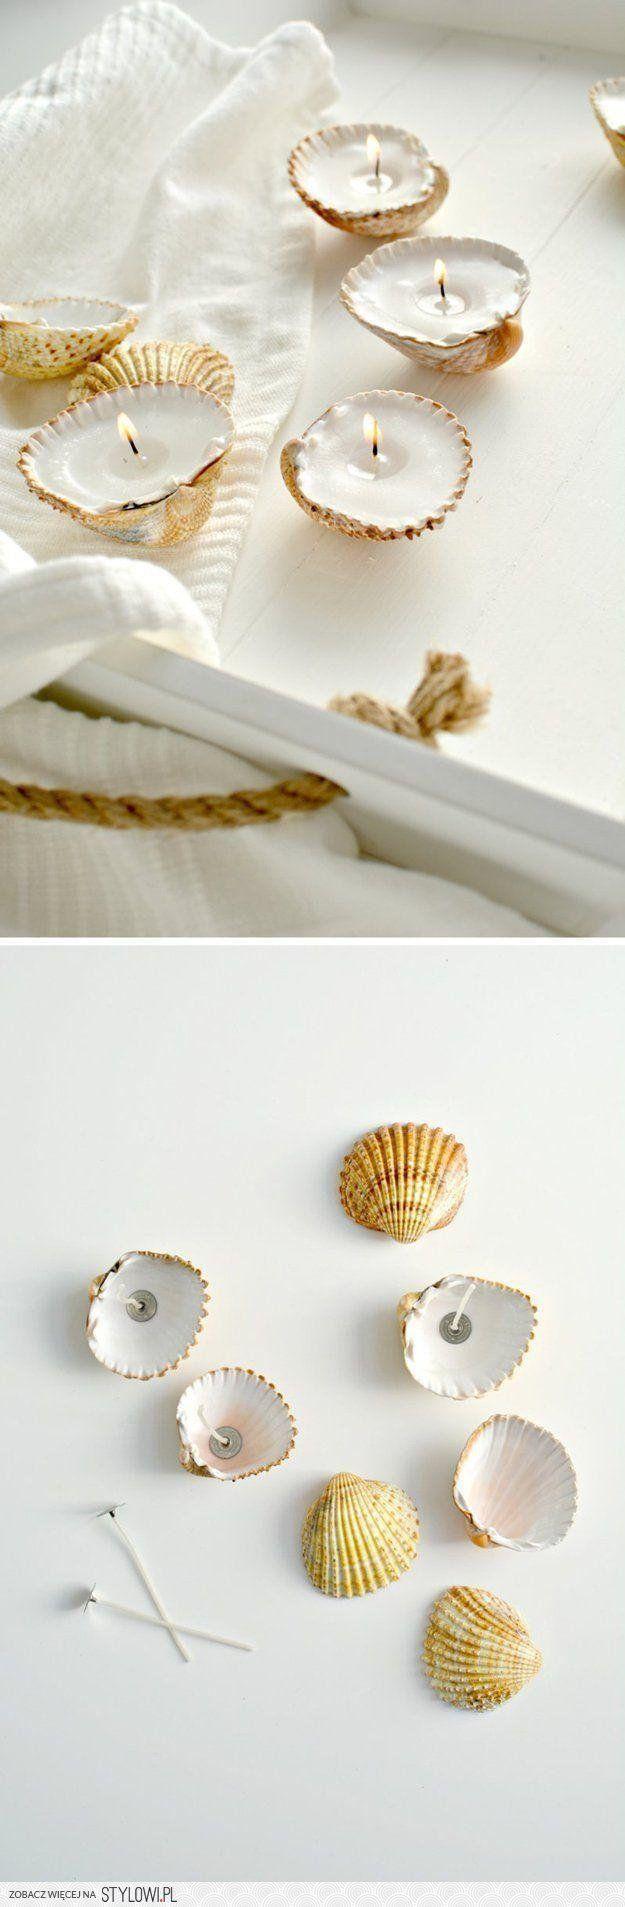 best 25 seashell candles ideas on pinterest shell candles